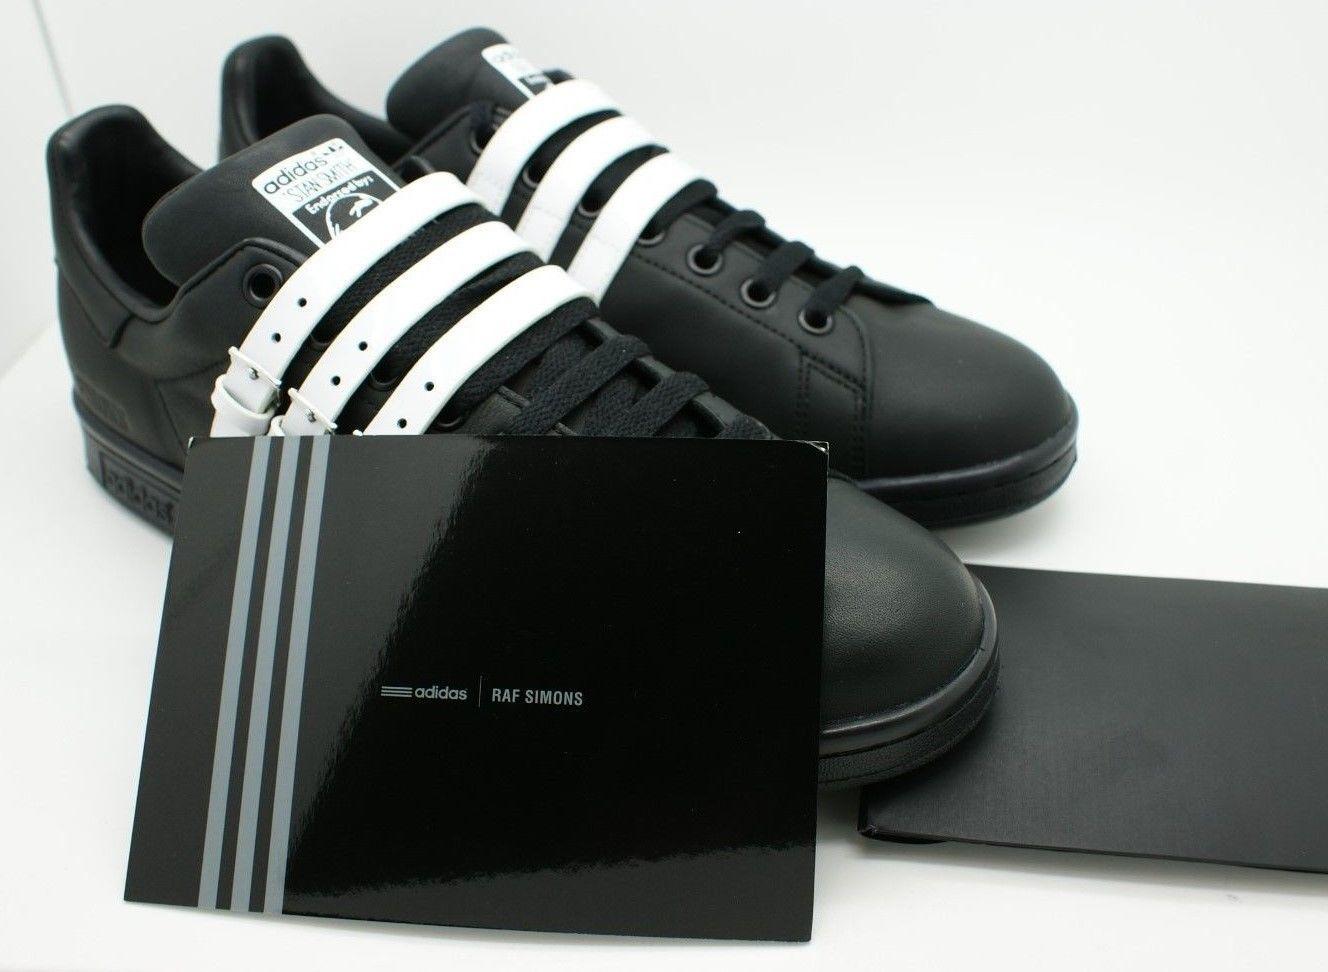 Adidas x Raf Simons Mens Stan Smith Strap Sneakers S75801 Black White 9.5 9  NIB 84e07813bf79